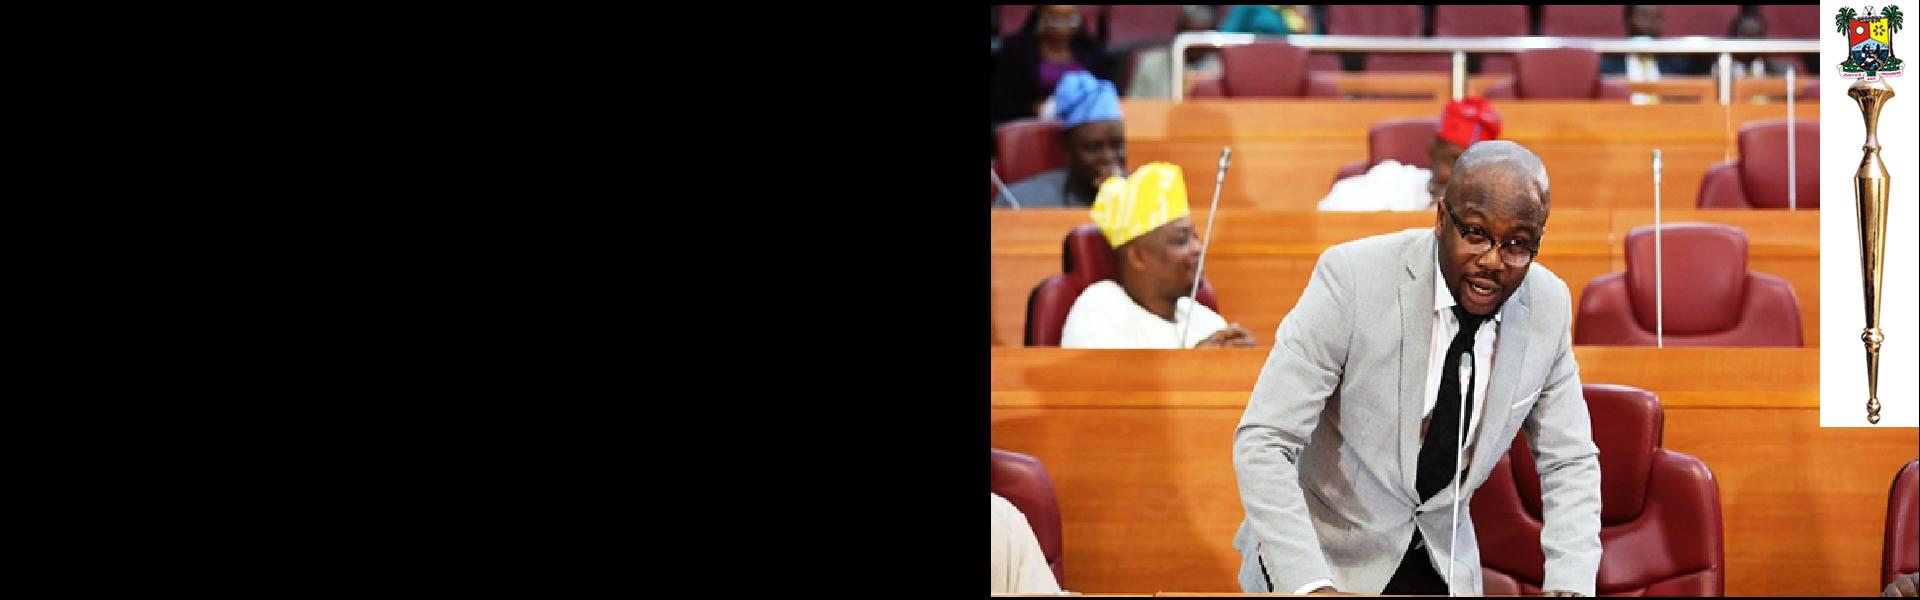 Lagos Youth Should Avoid Bad Gang – Hon. A.R. Kasunmu